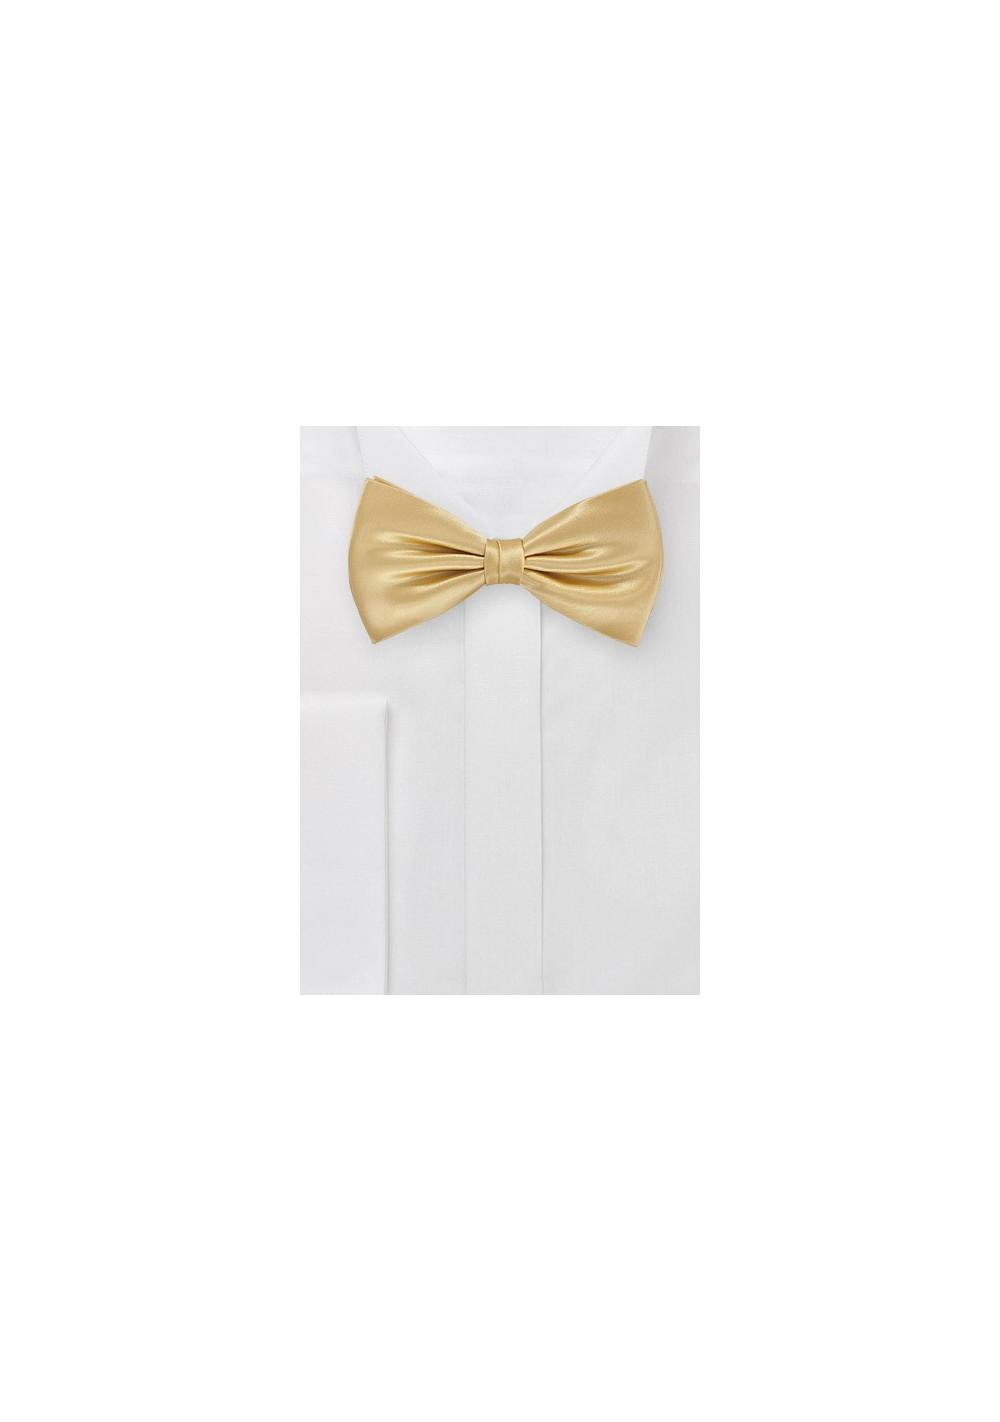 Vintage Gold Bow Tie